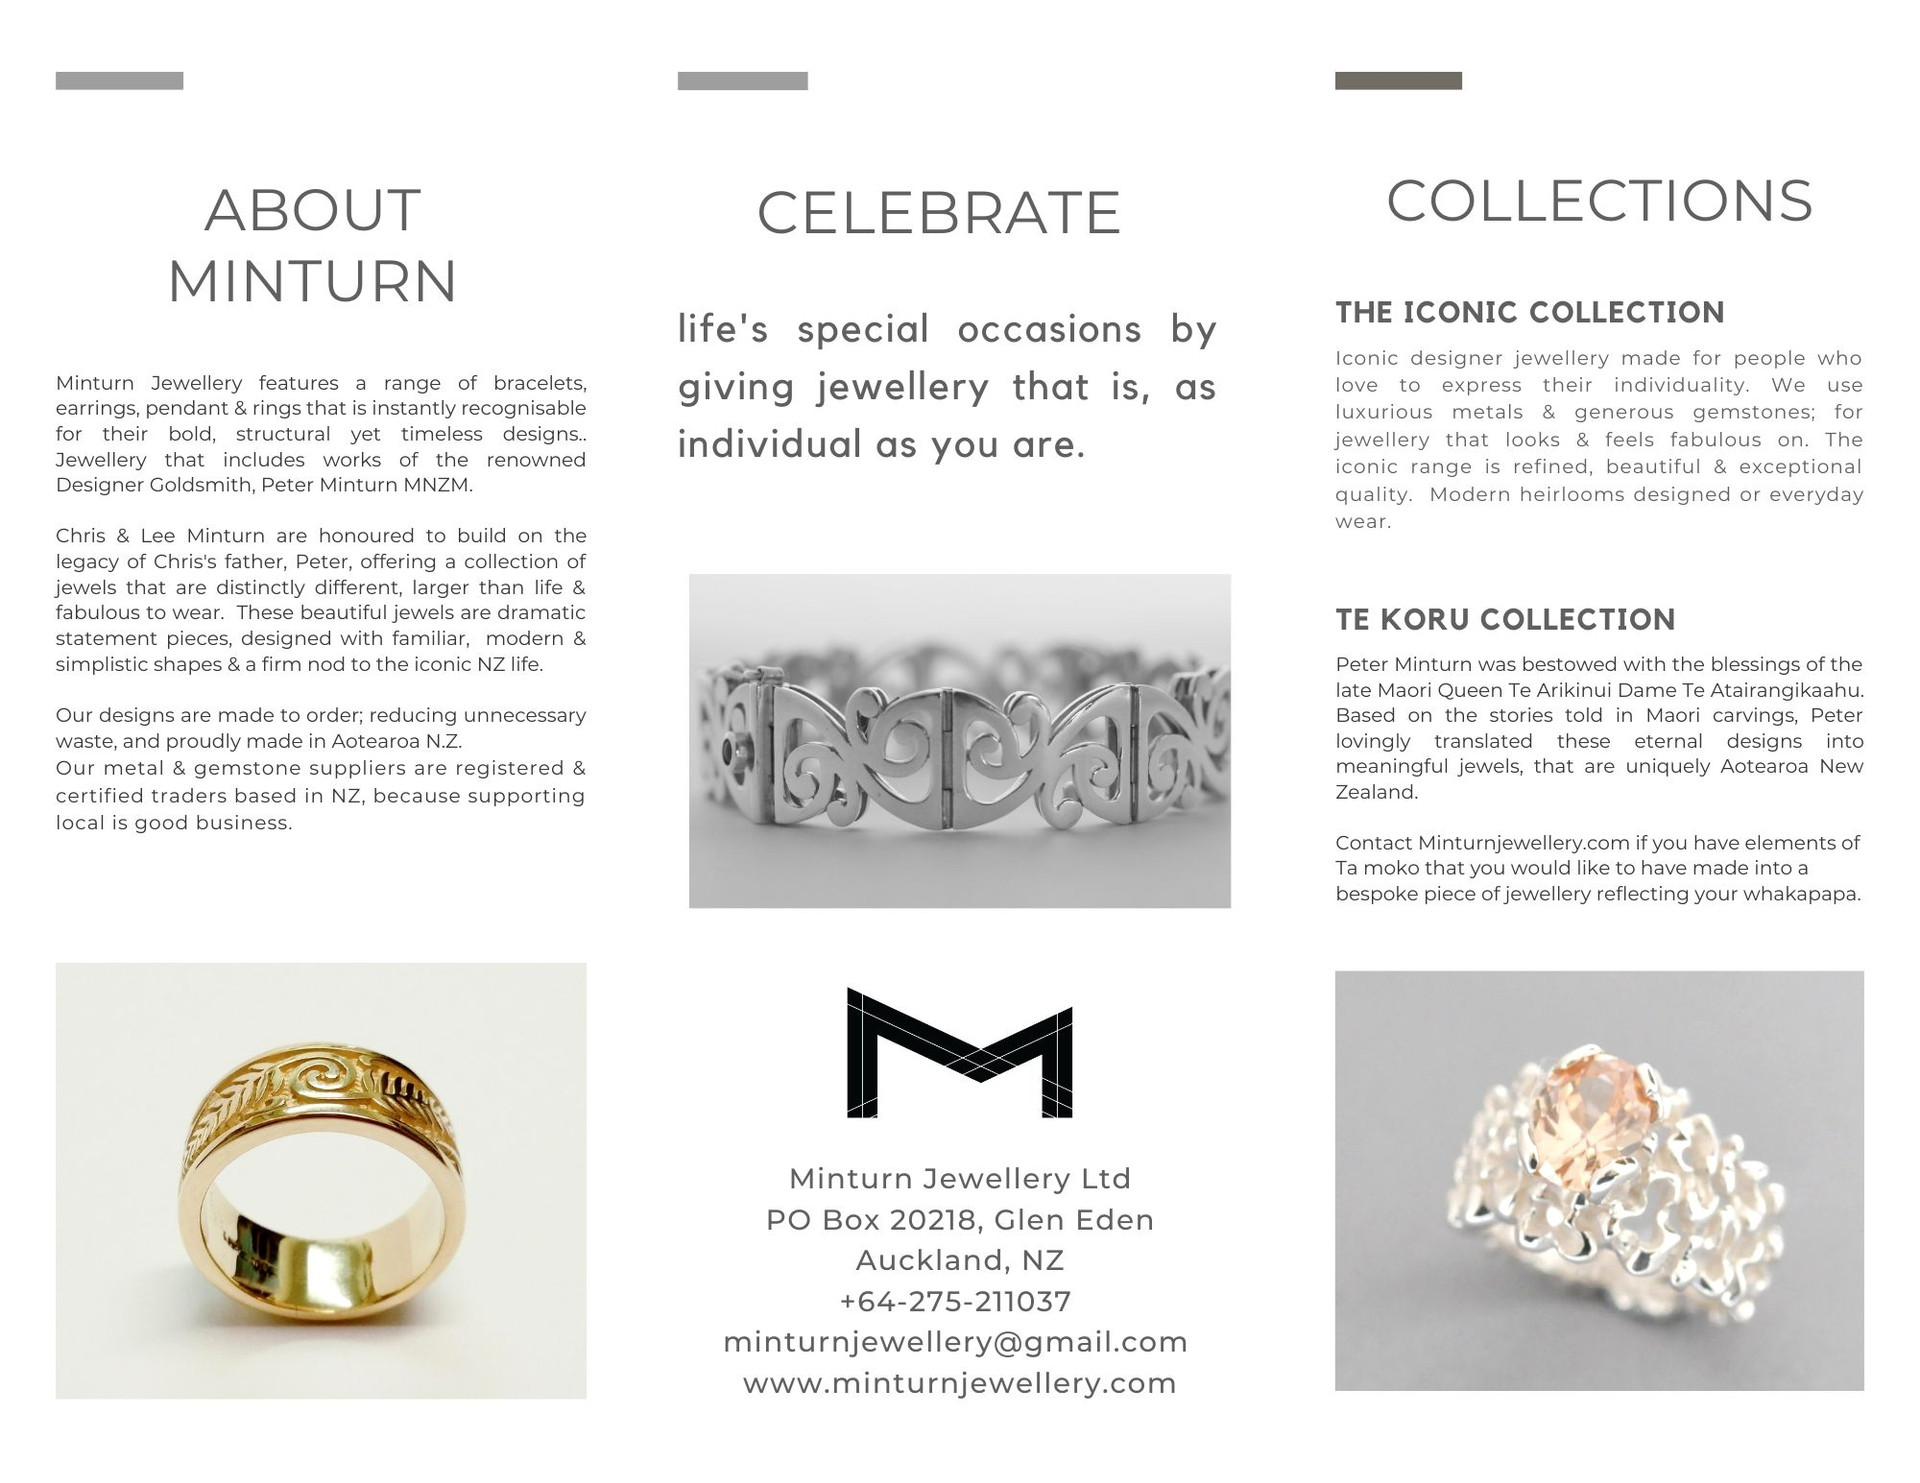 About Minturn Jewellery